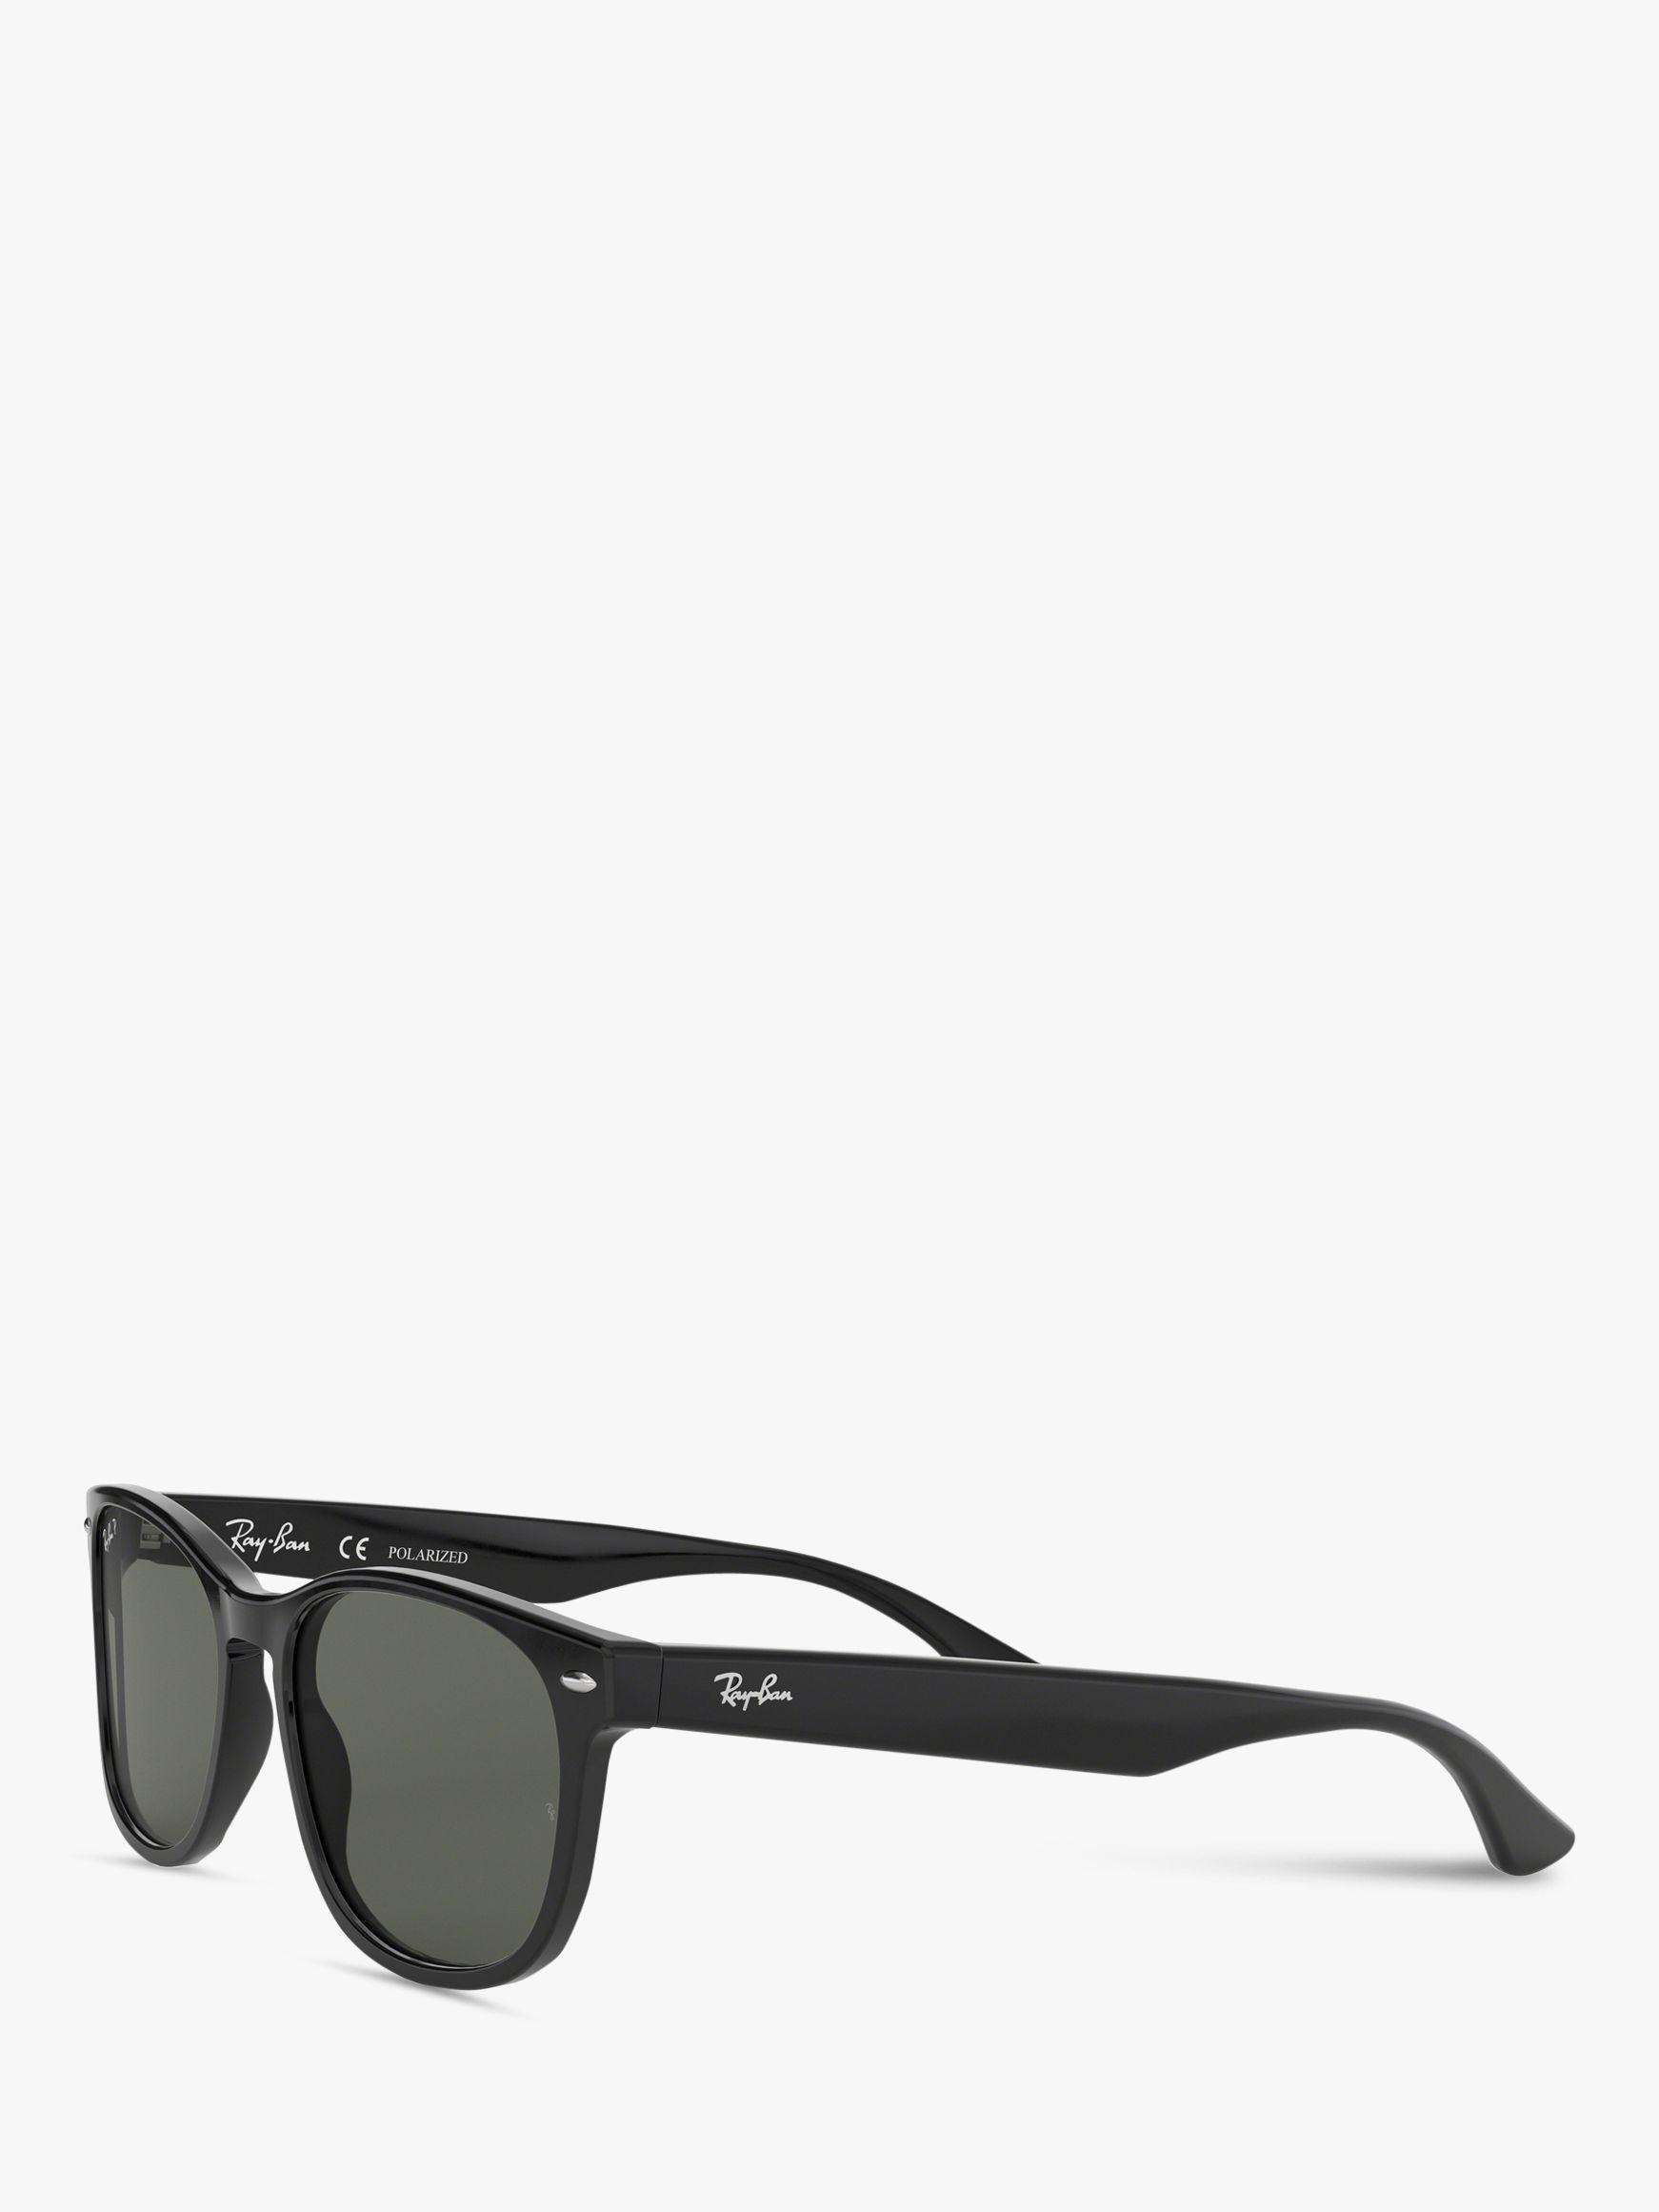 b364933fe2 Ray-Ban Rb2184 Women s Polarised Square Sunglasses in Black - Lyst